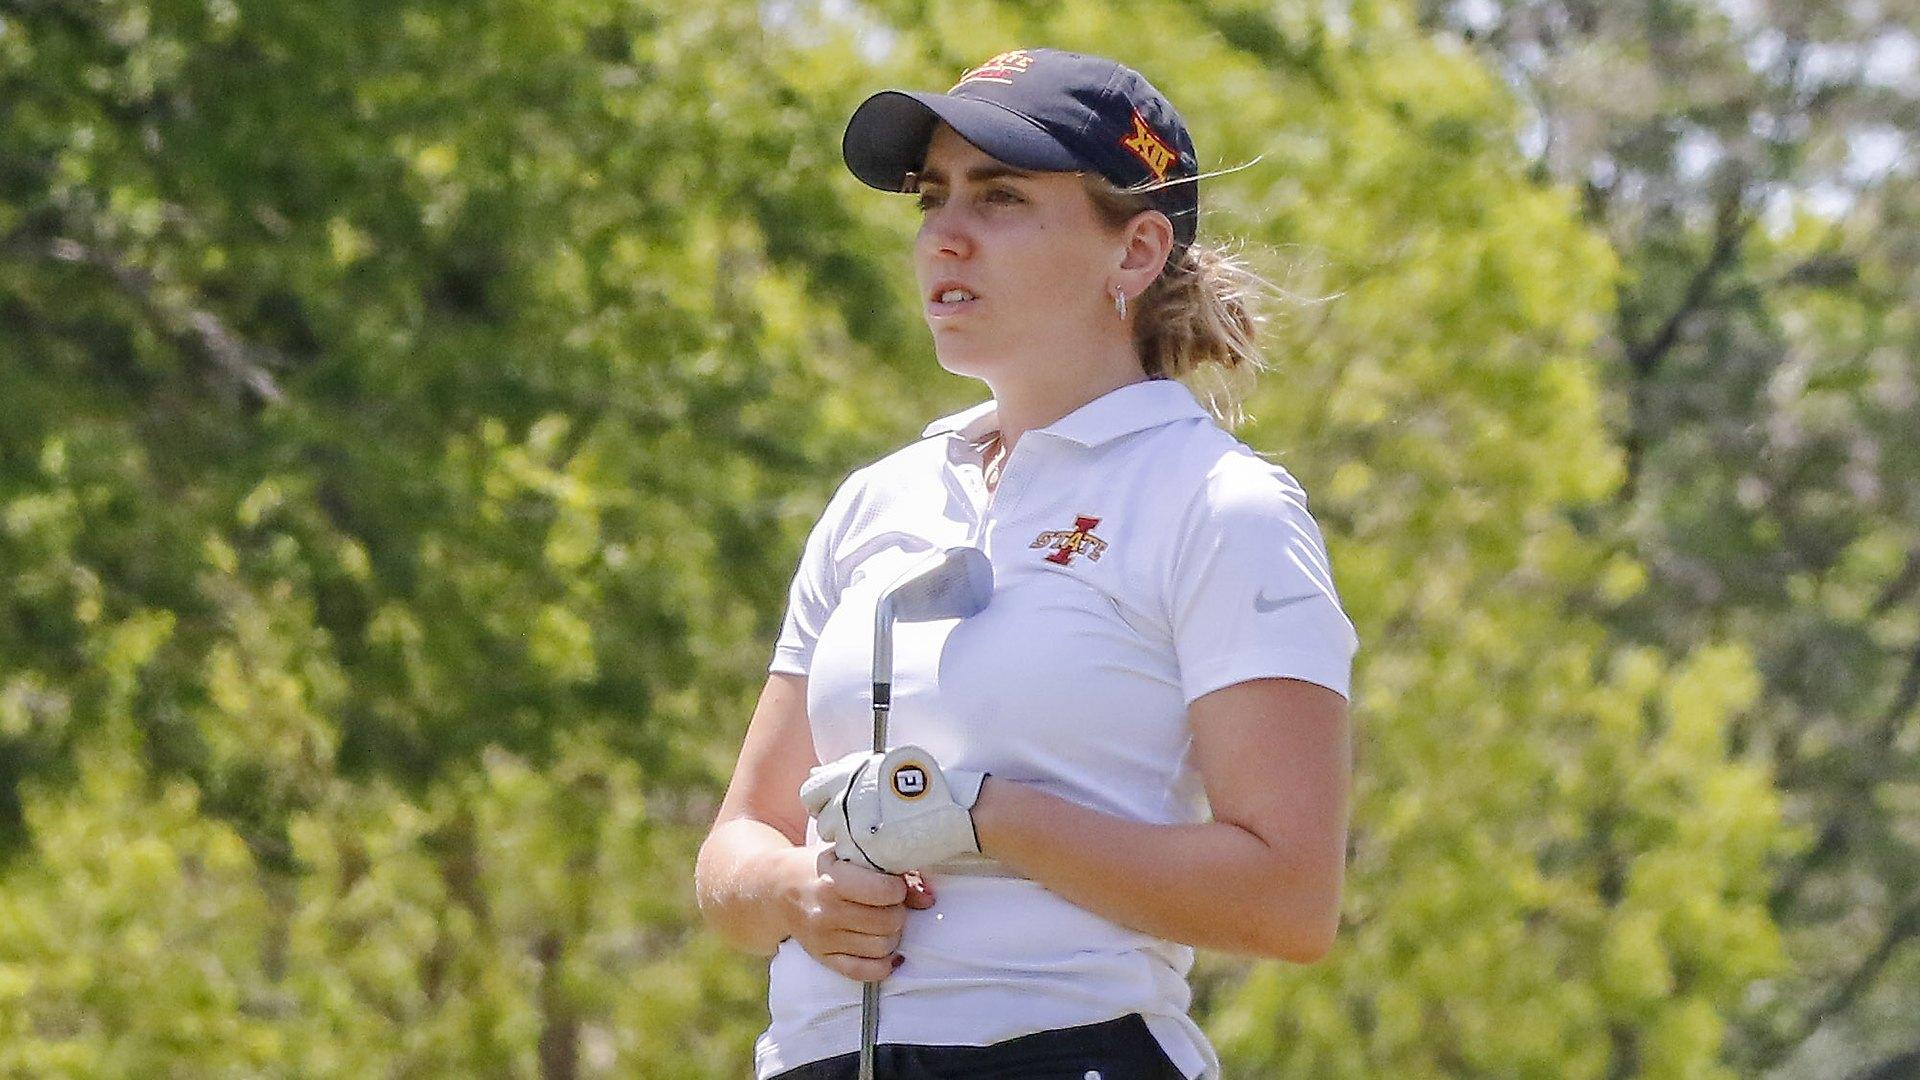 Former Iowa State Golfer Celia Barquin Arozamena Found Dead on Course, Murder Suspect in Custody